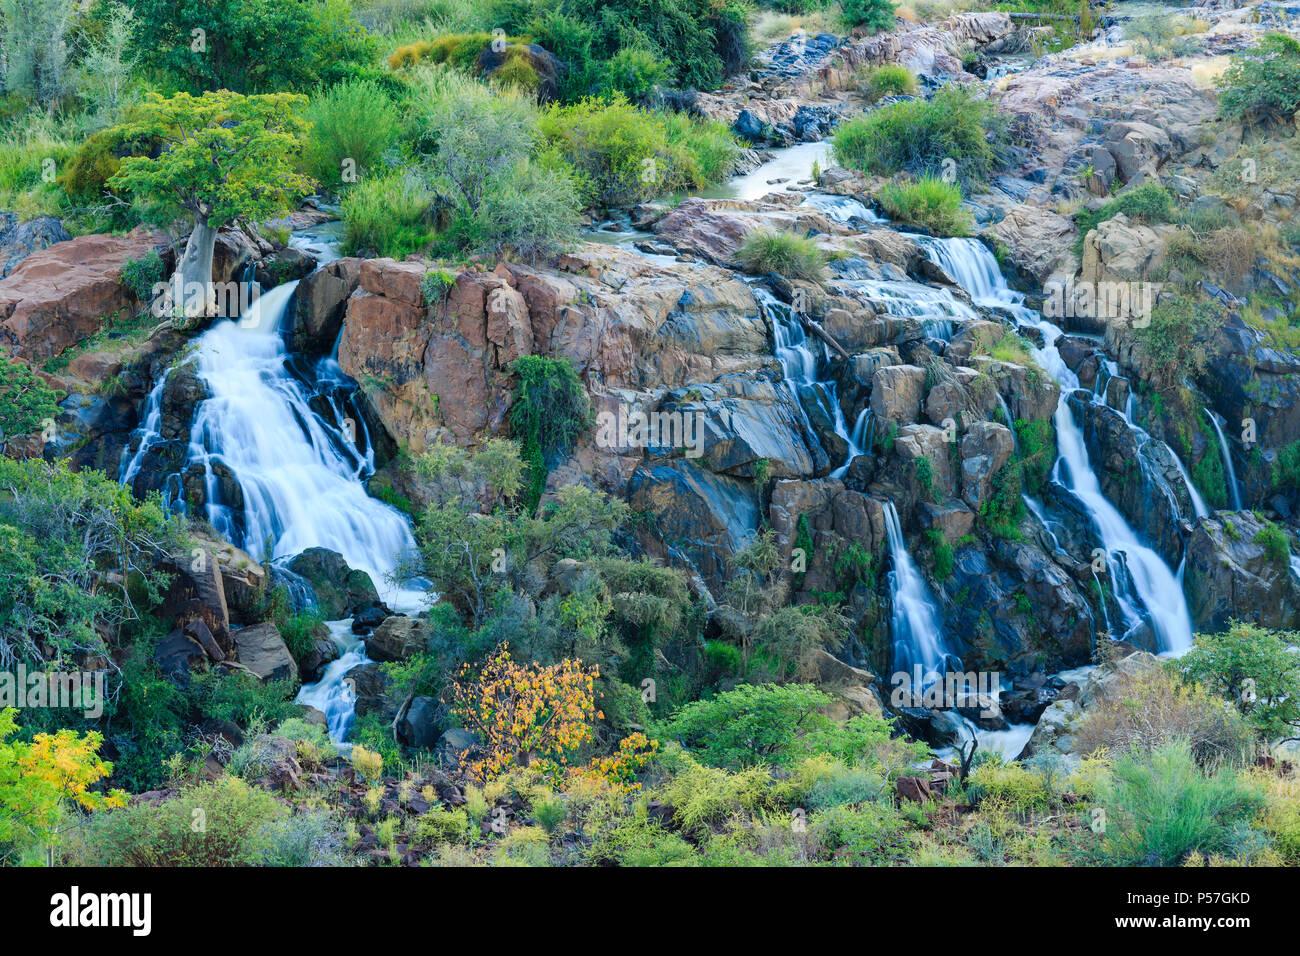 Epupa Falls, Kunene, Kunene Region, Namibia - Stock Image